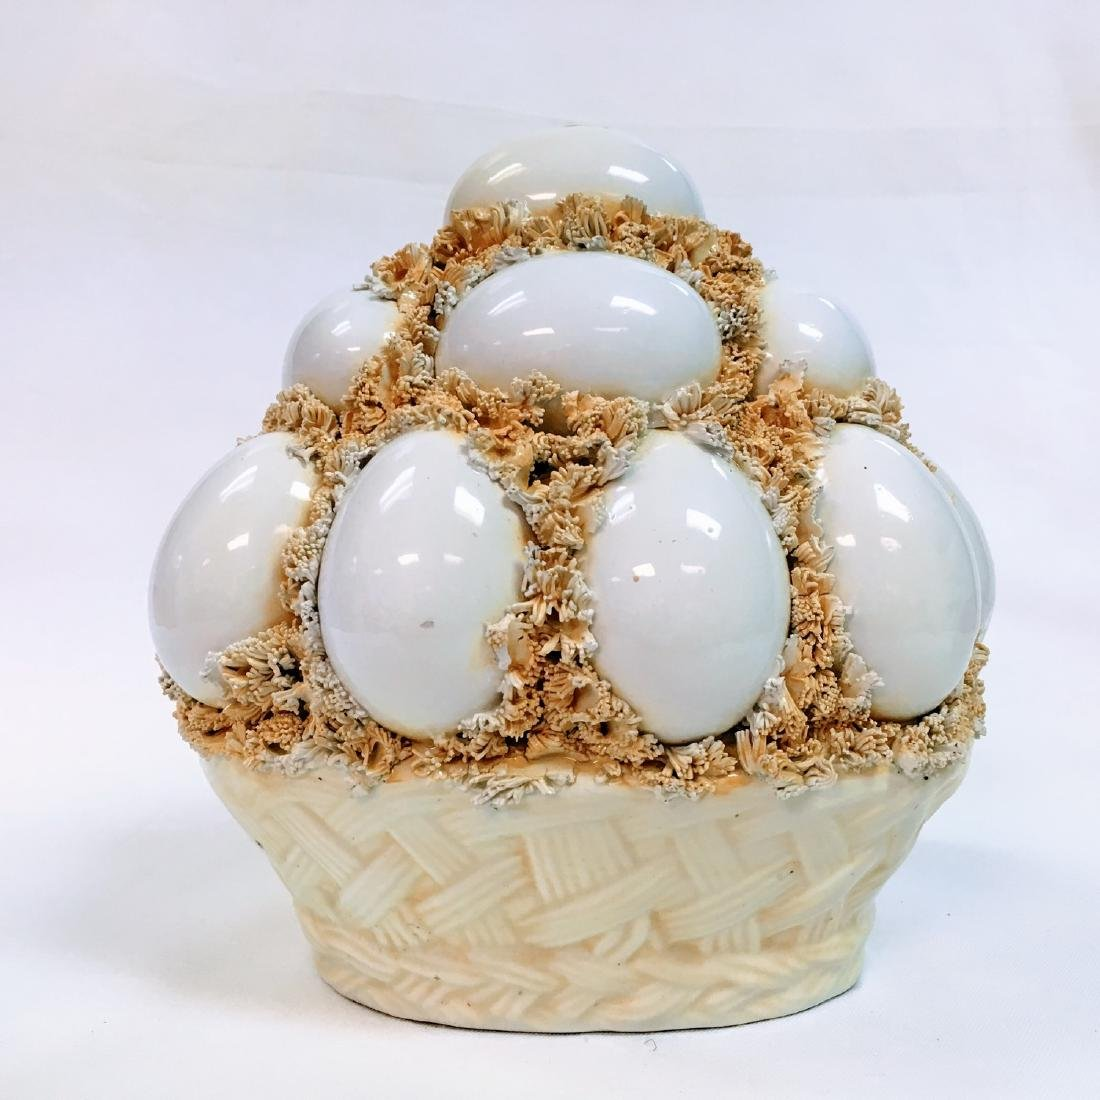 Vtg Italian Pottery  Basket of Stacked Egg Centerpiece